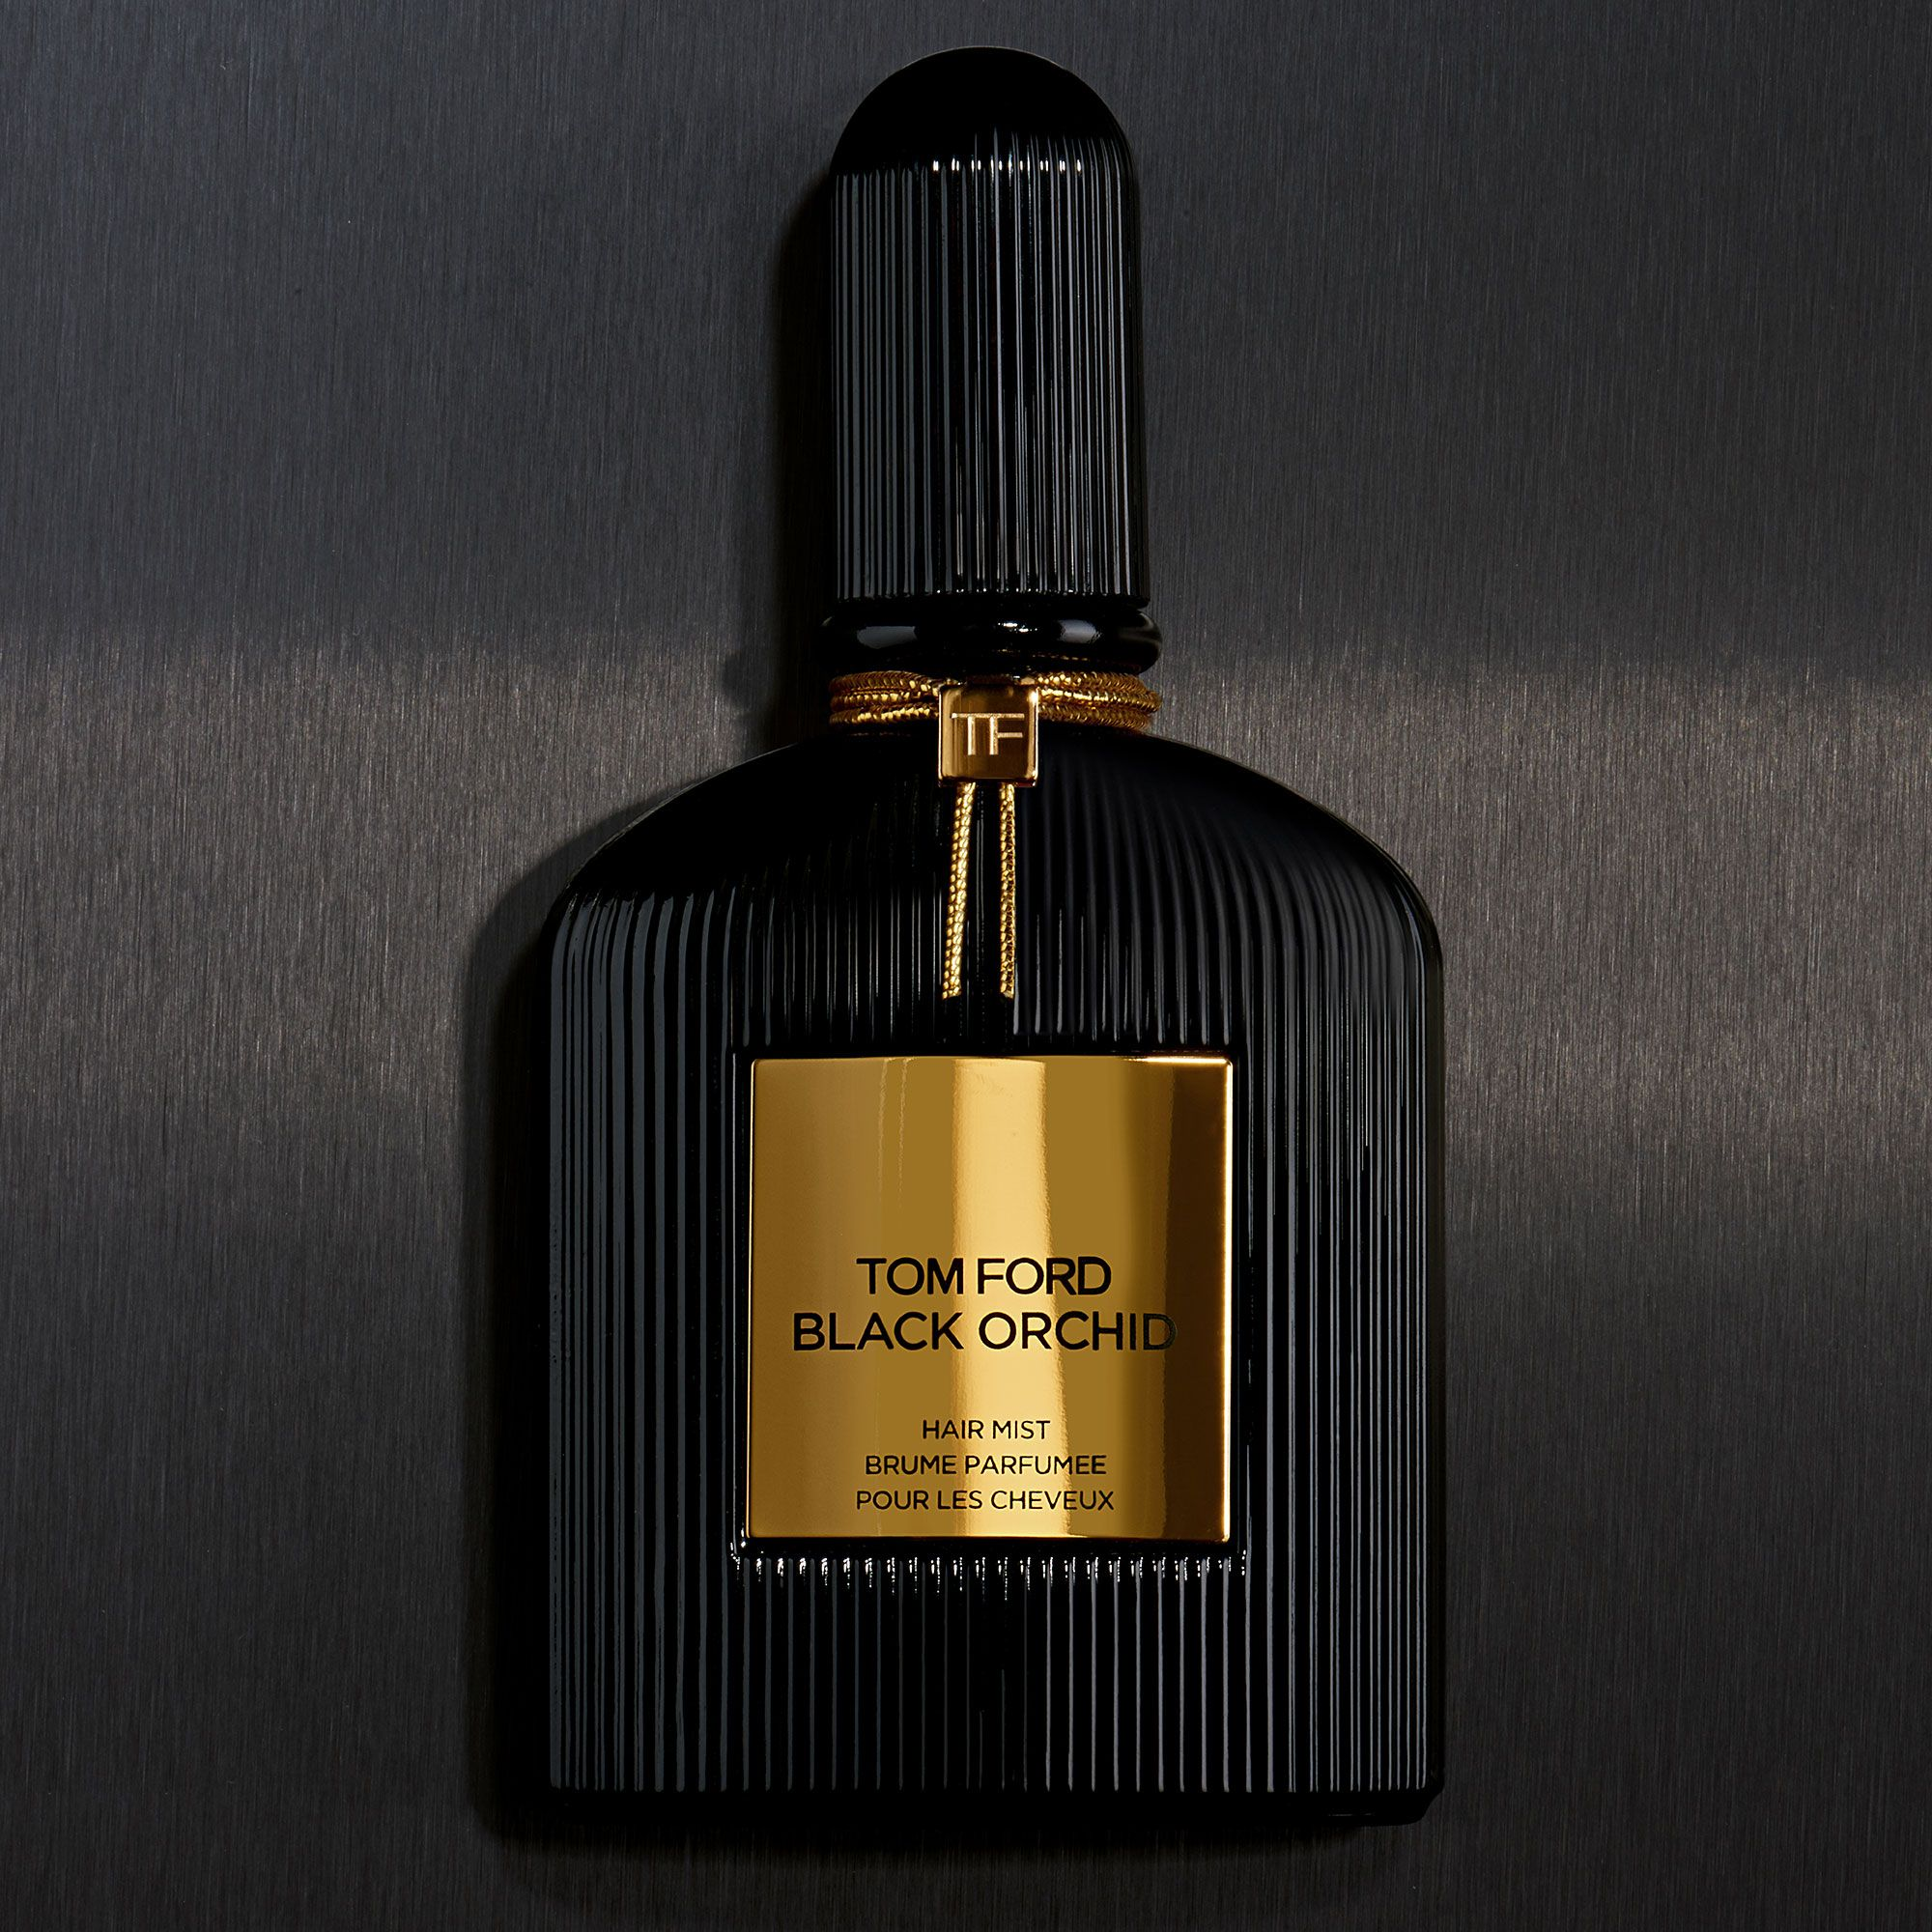 84978e8f2911 Experience Black Orchid Hair Mist.  TOMFORD  BLACKORCHID  TFGIFTS